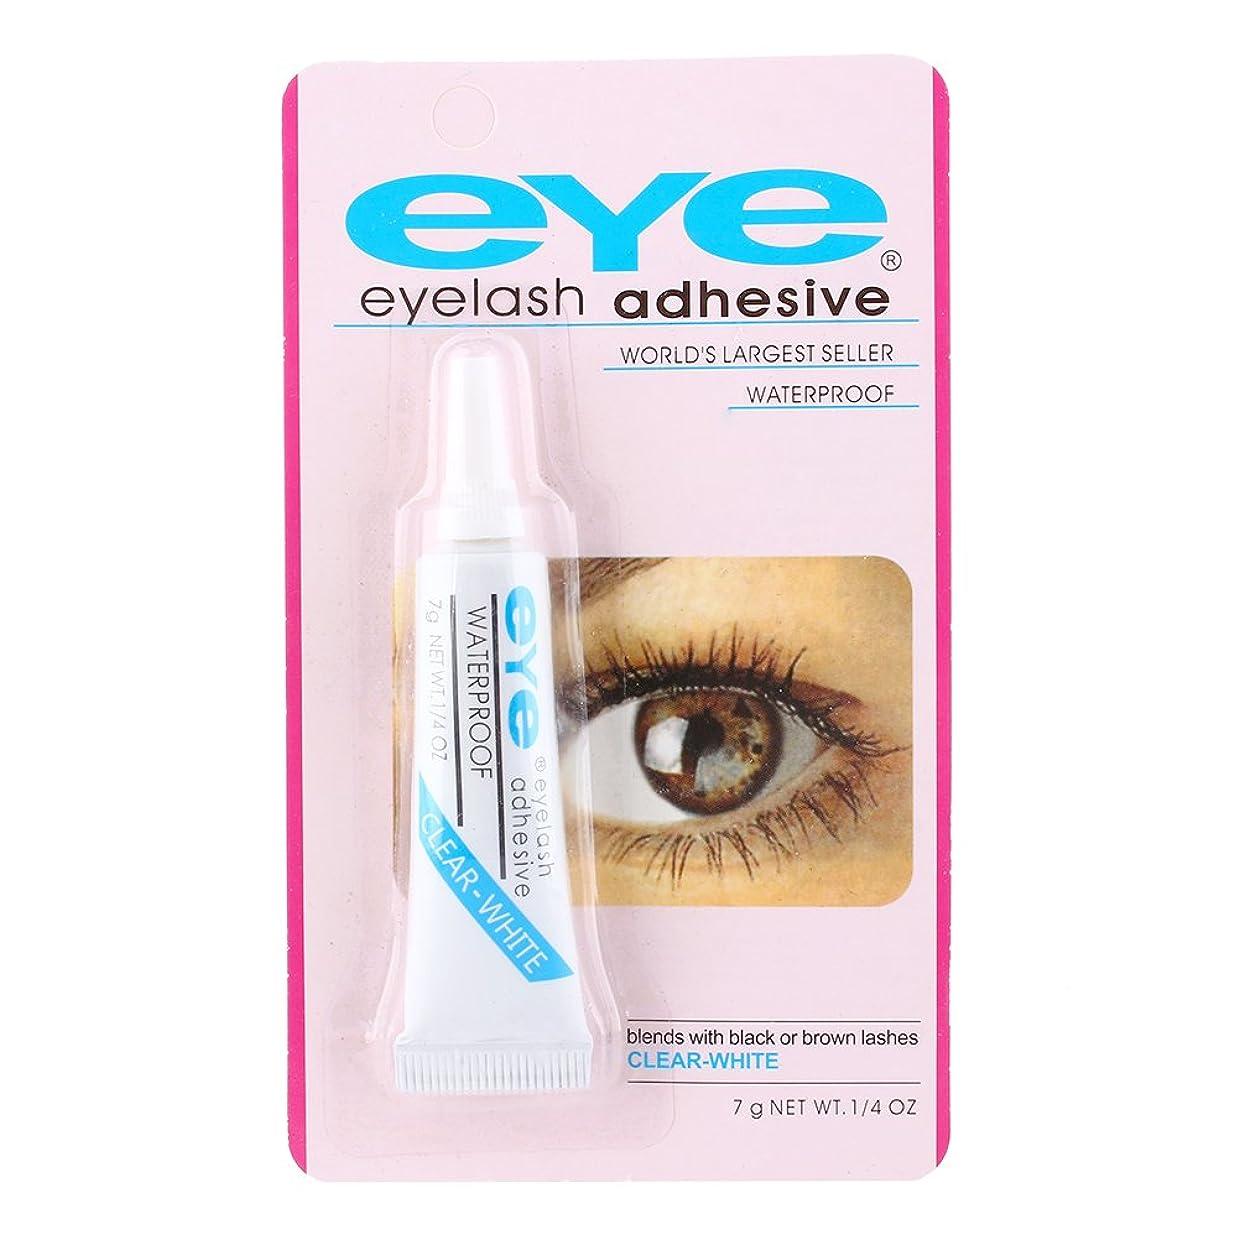 b797c9a56a4 Eyelashes Adhesive Glue,Waterproof Super Strong Hold Clear Strip Eye Lash  Adhesives